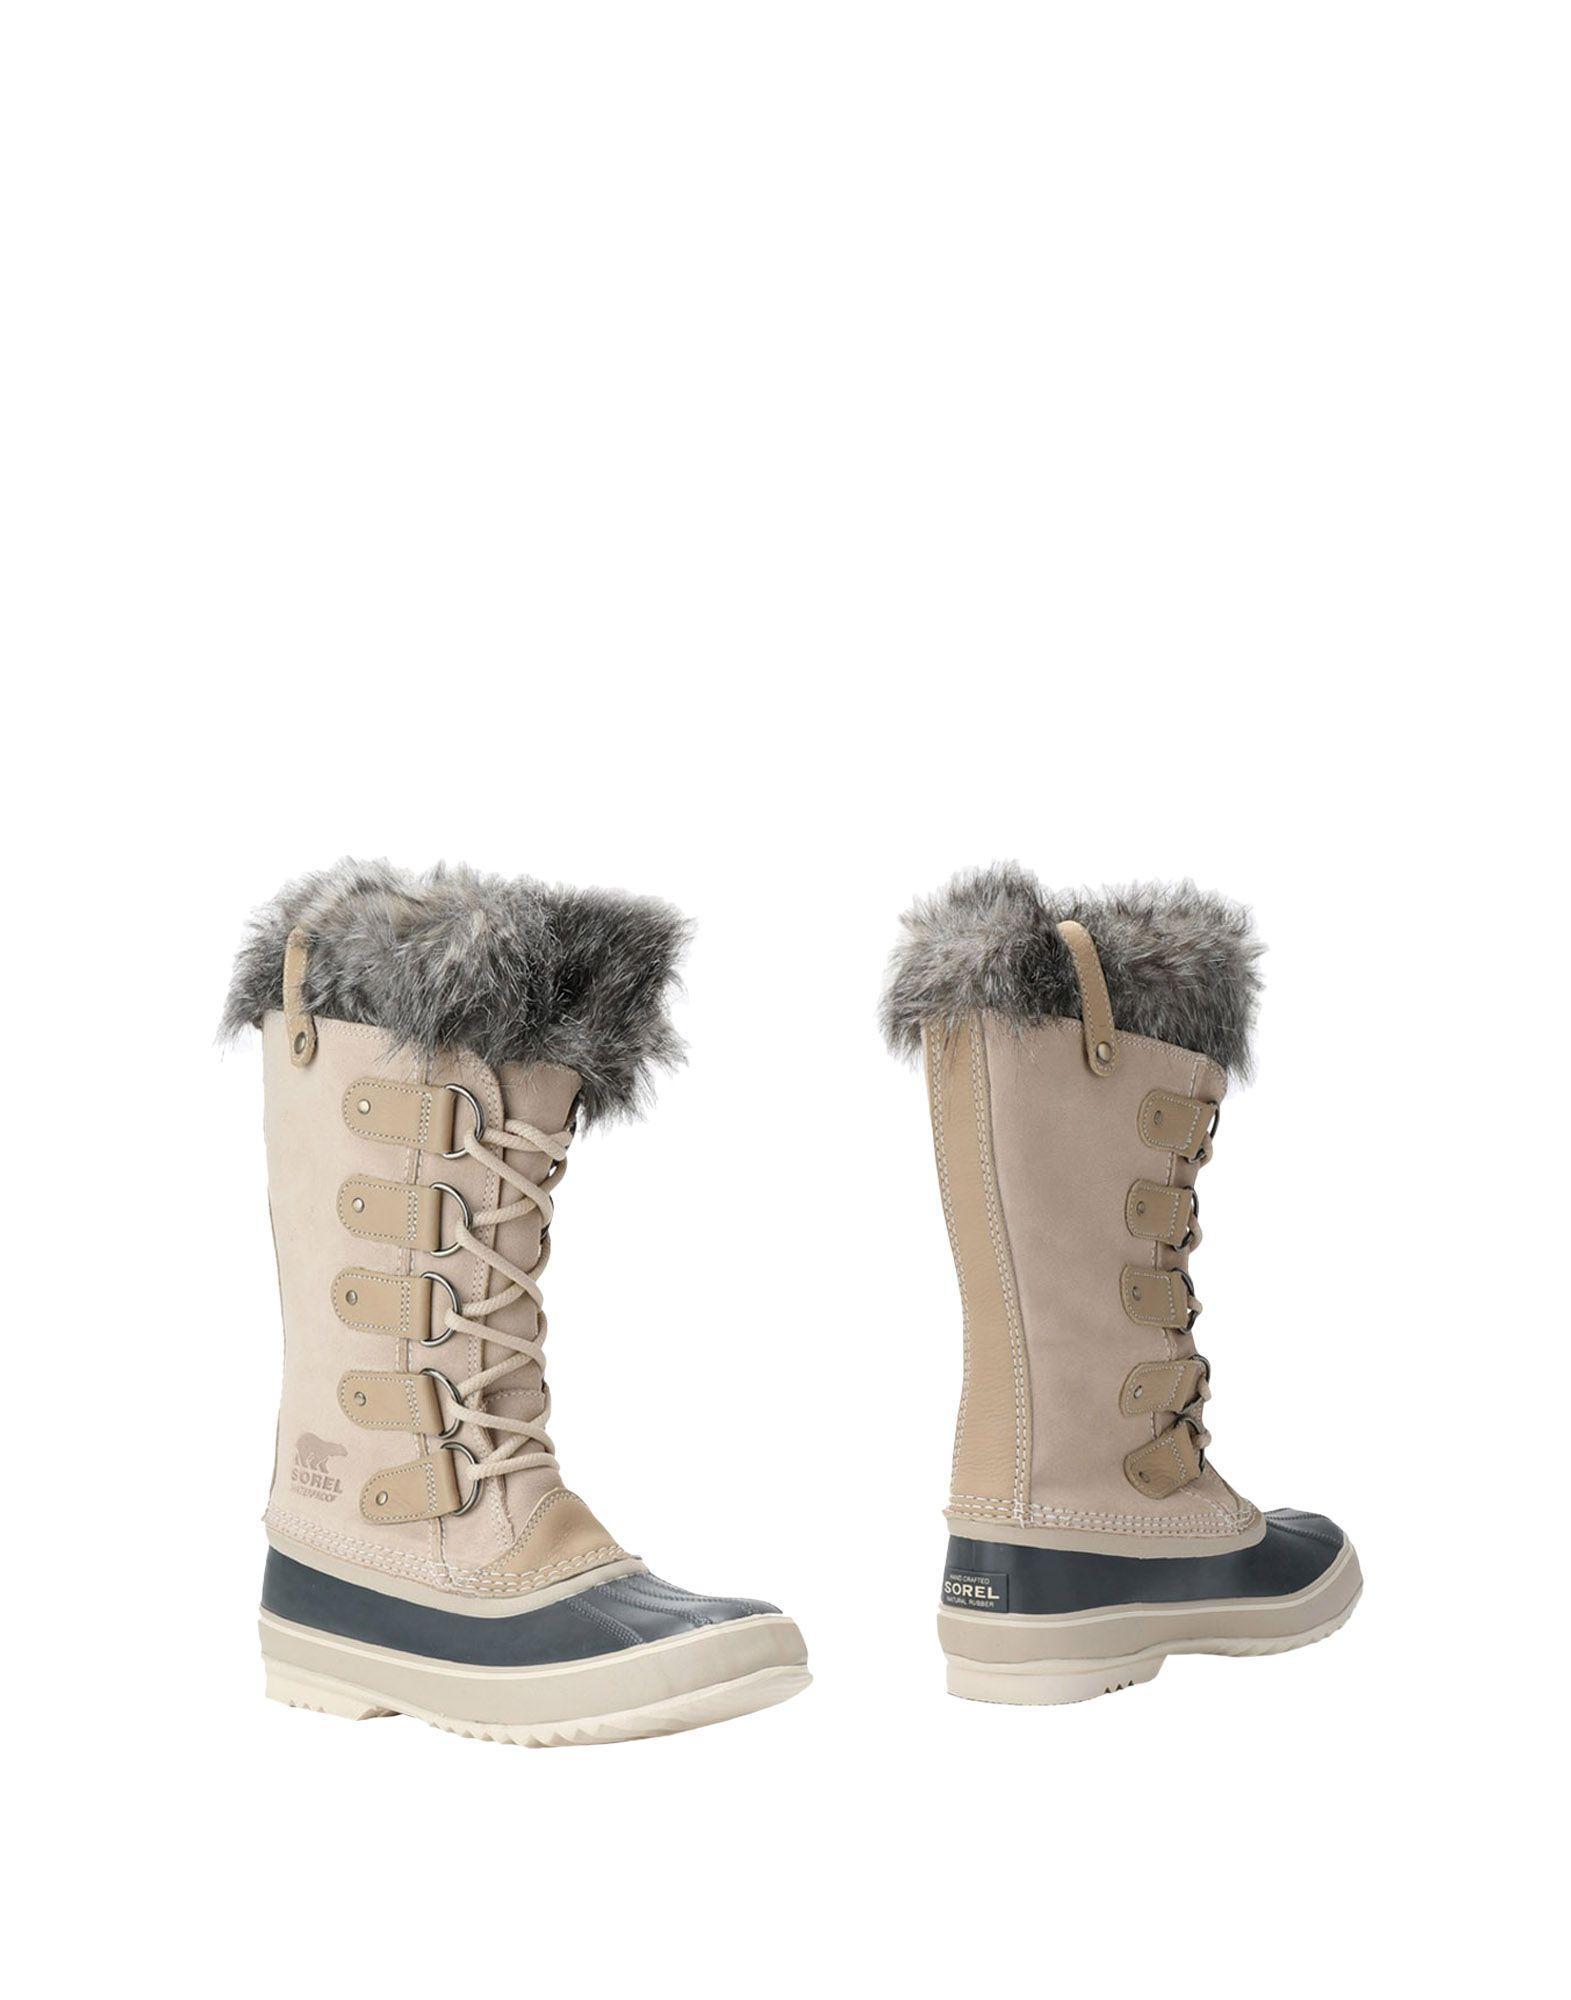 Stivali Sorel Joan Of Arctic - Donna - Acquista online su